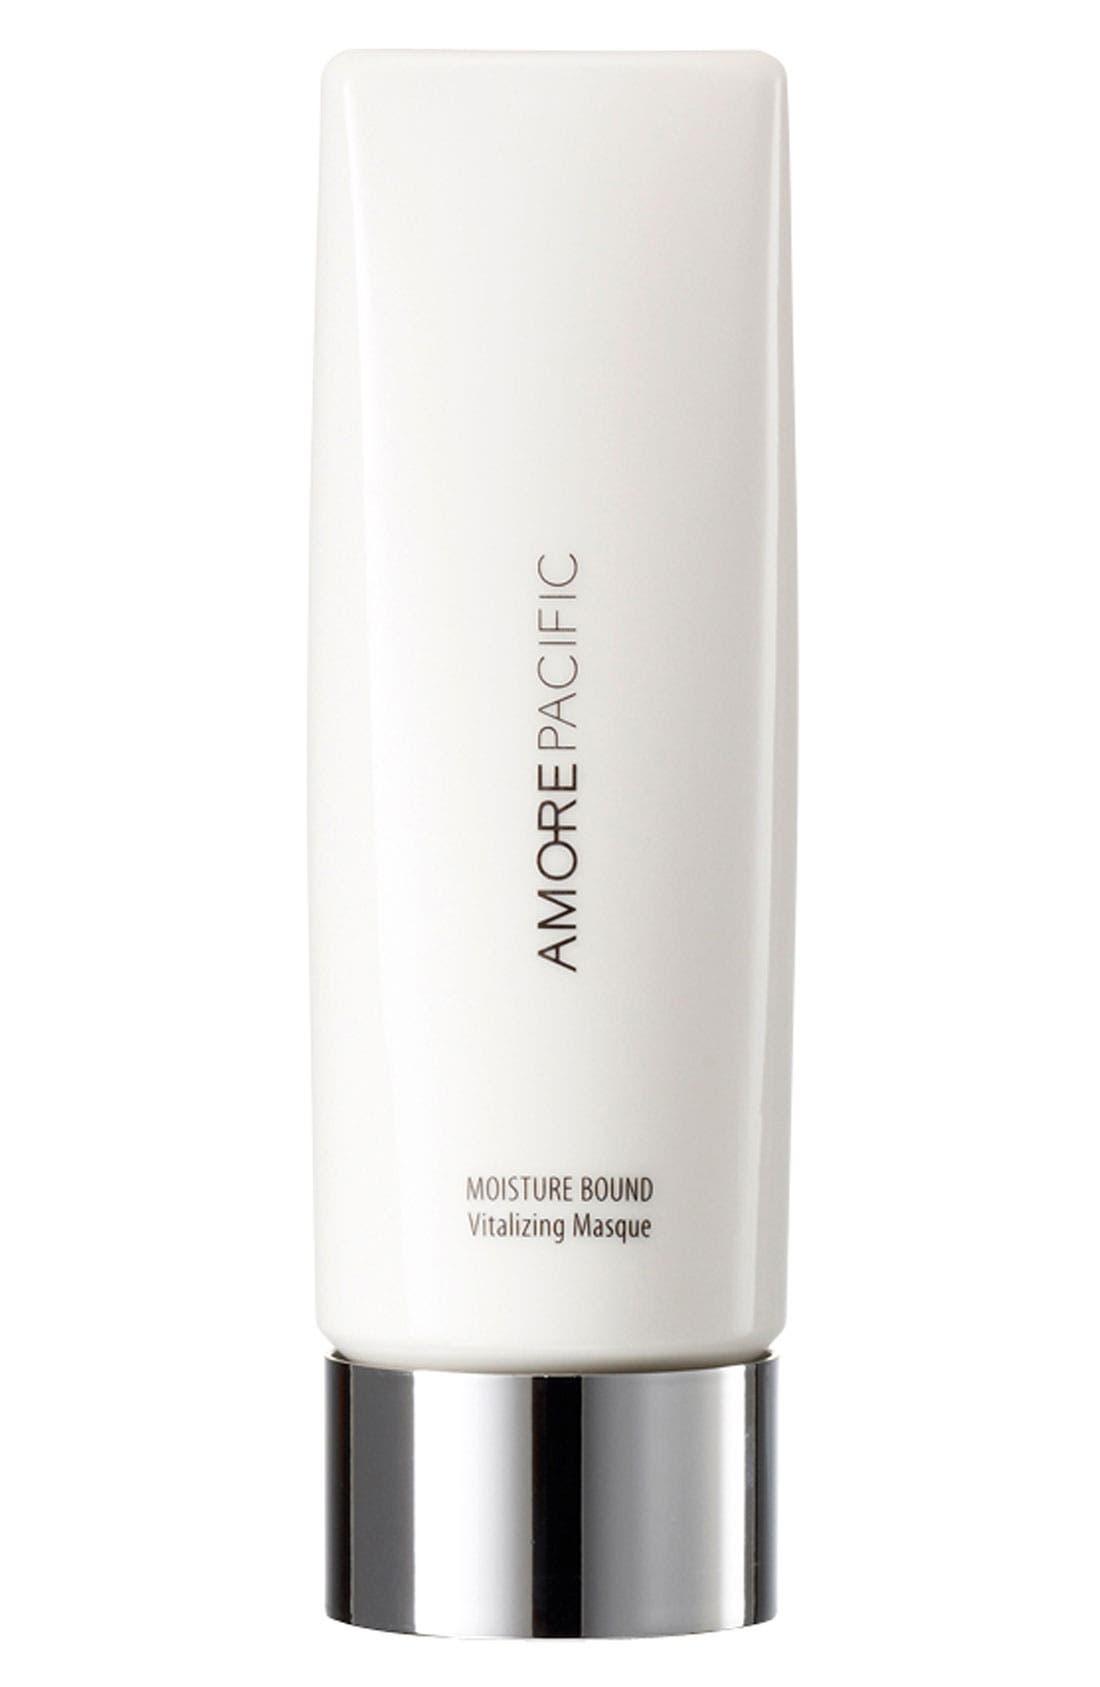 AMOREPACIFIC 'Moisture Bound' Vitalizing Face Masque, Main, color, 000